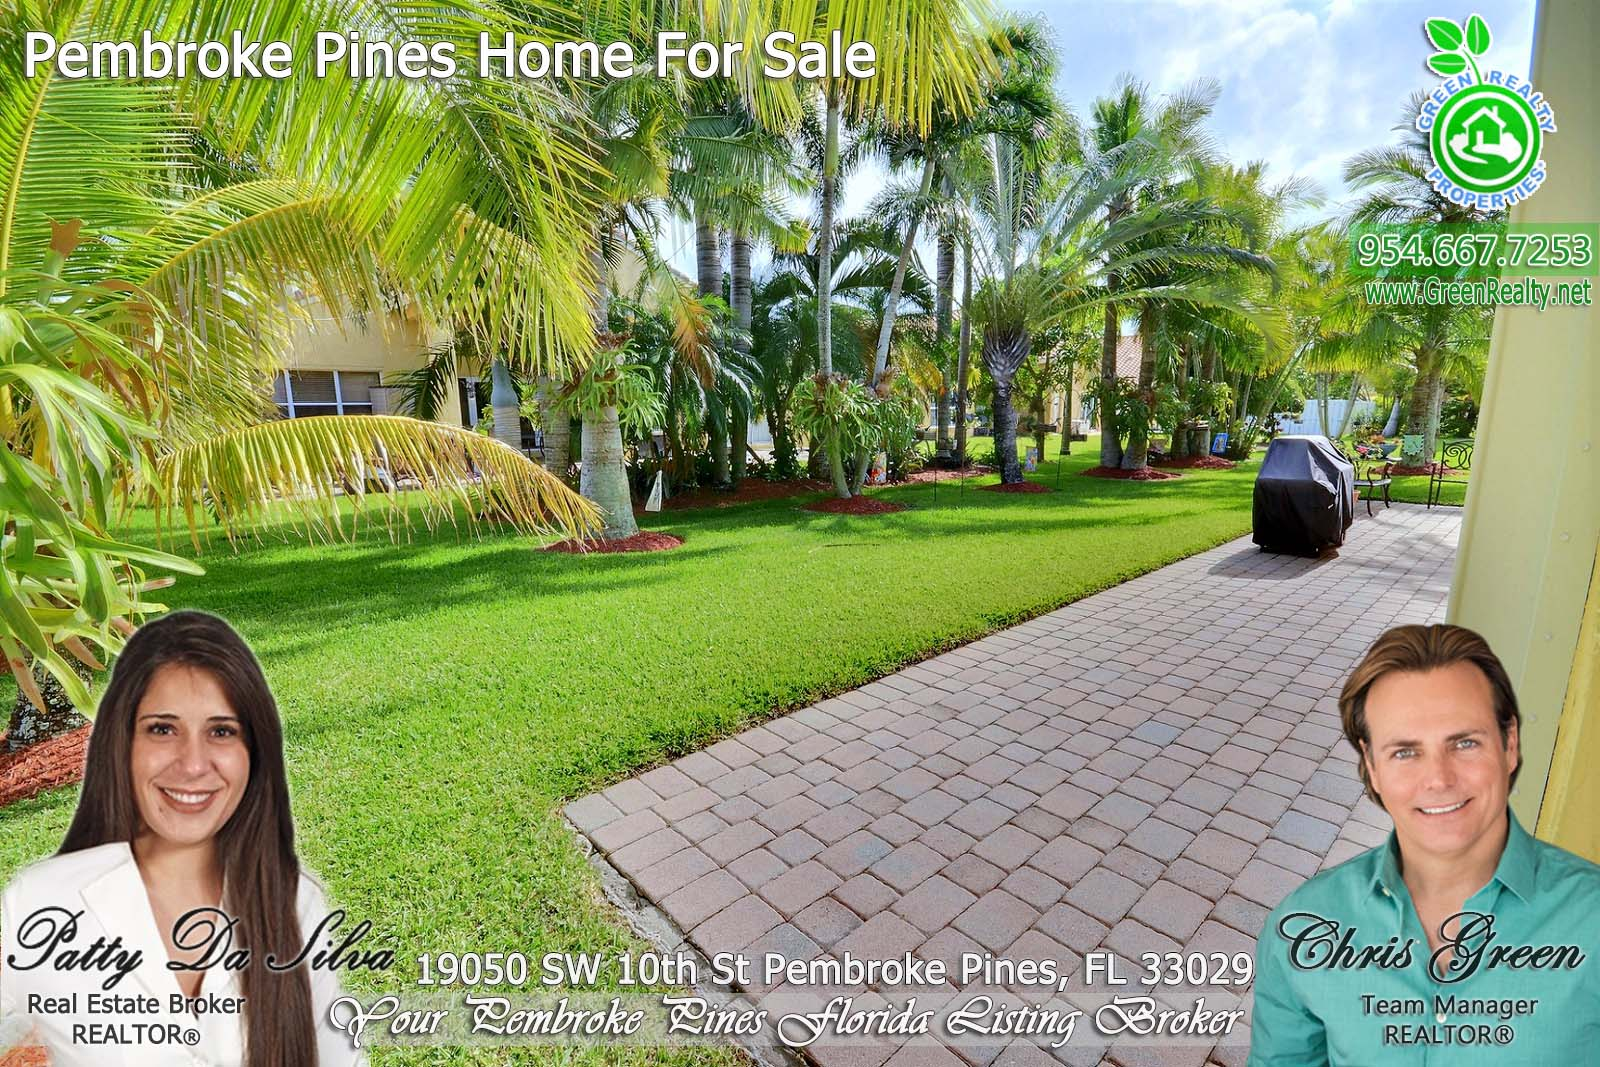 28 Homes For Sale in Encantada Pembroke Pines (3)